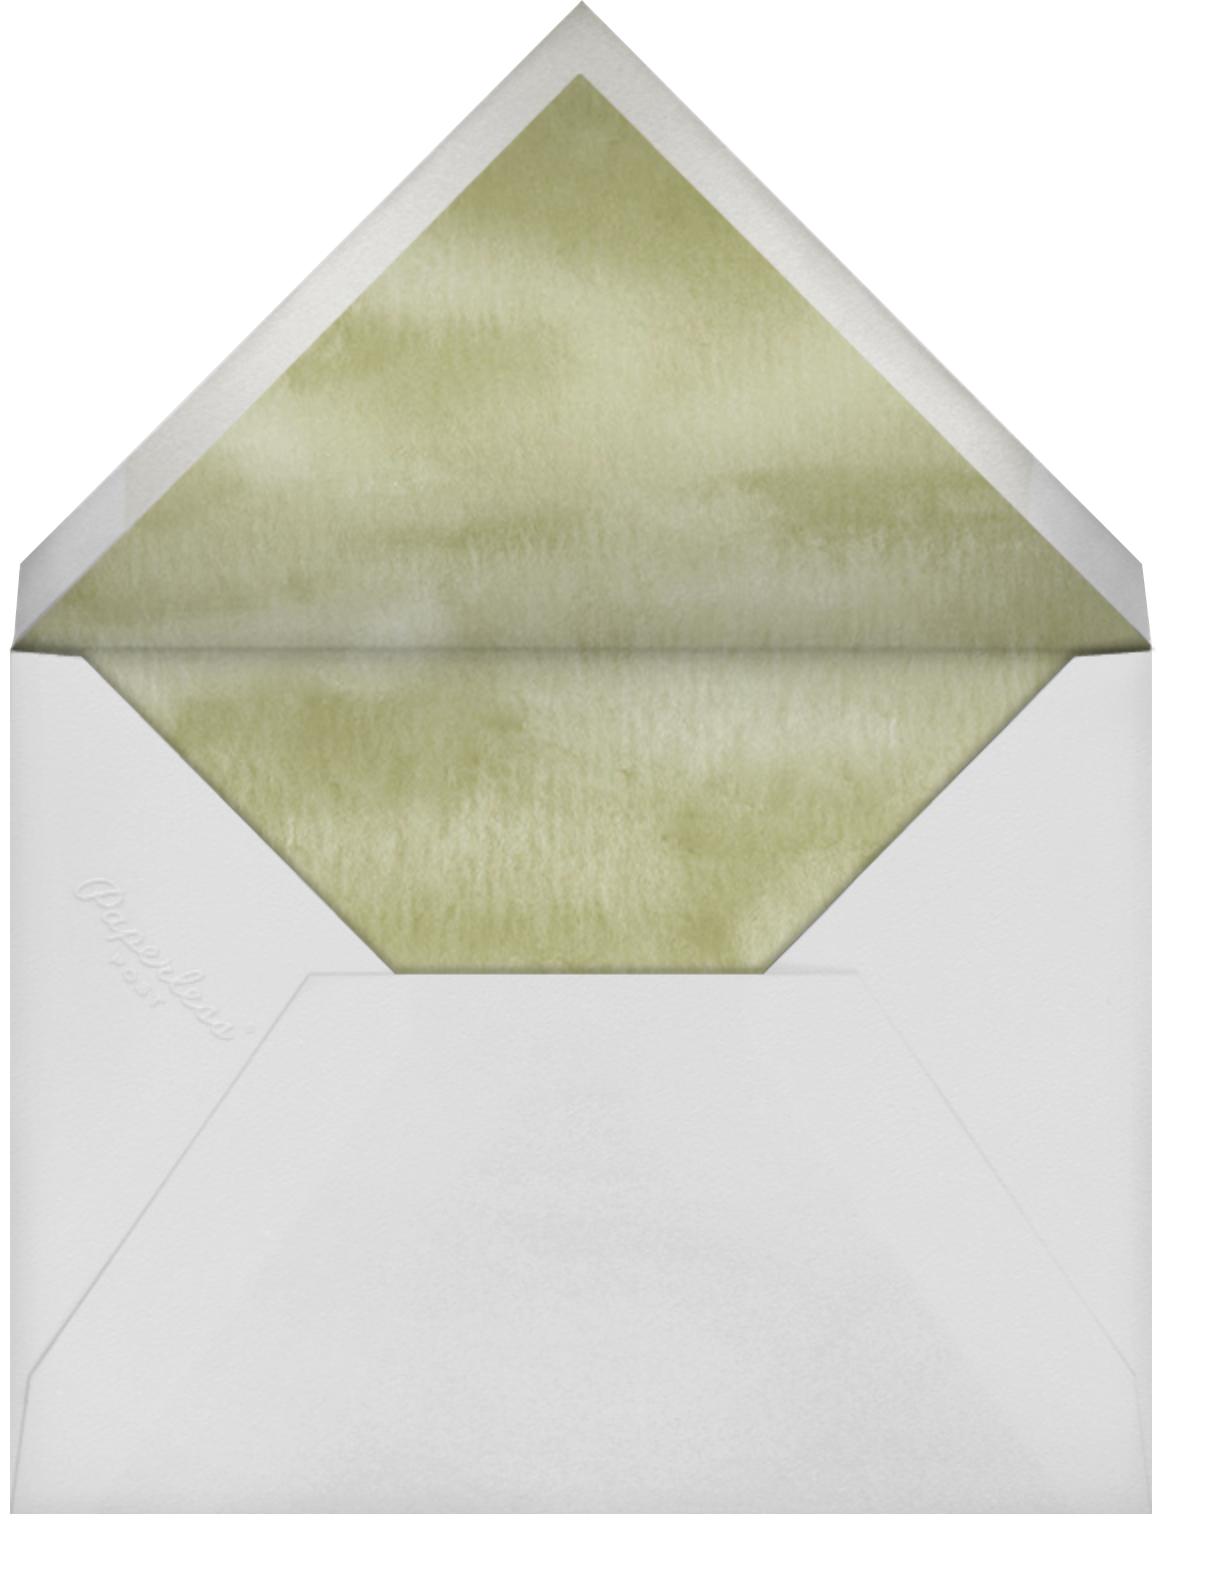 Olive Branch - Paper Source - Save the date - envelope back